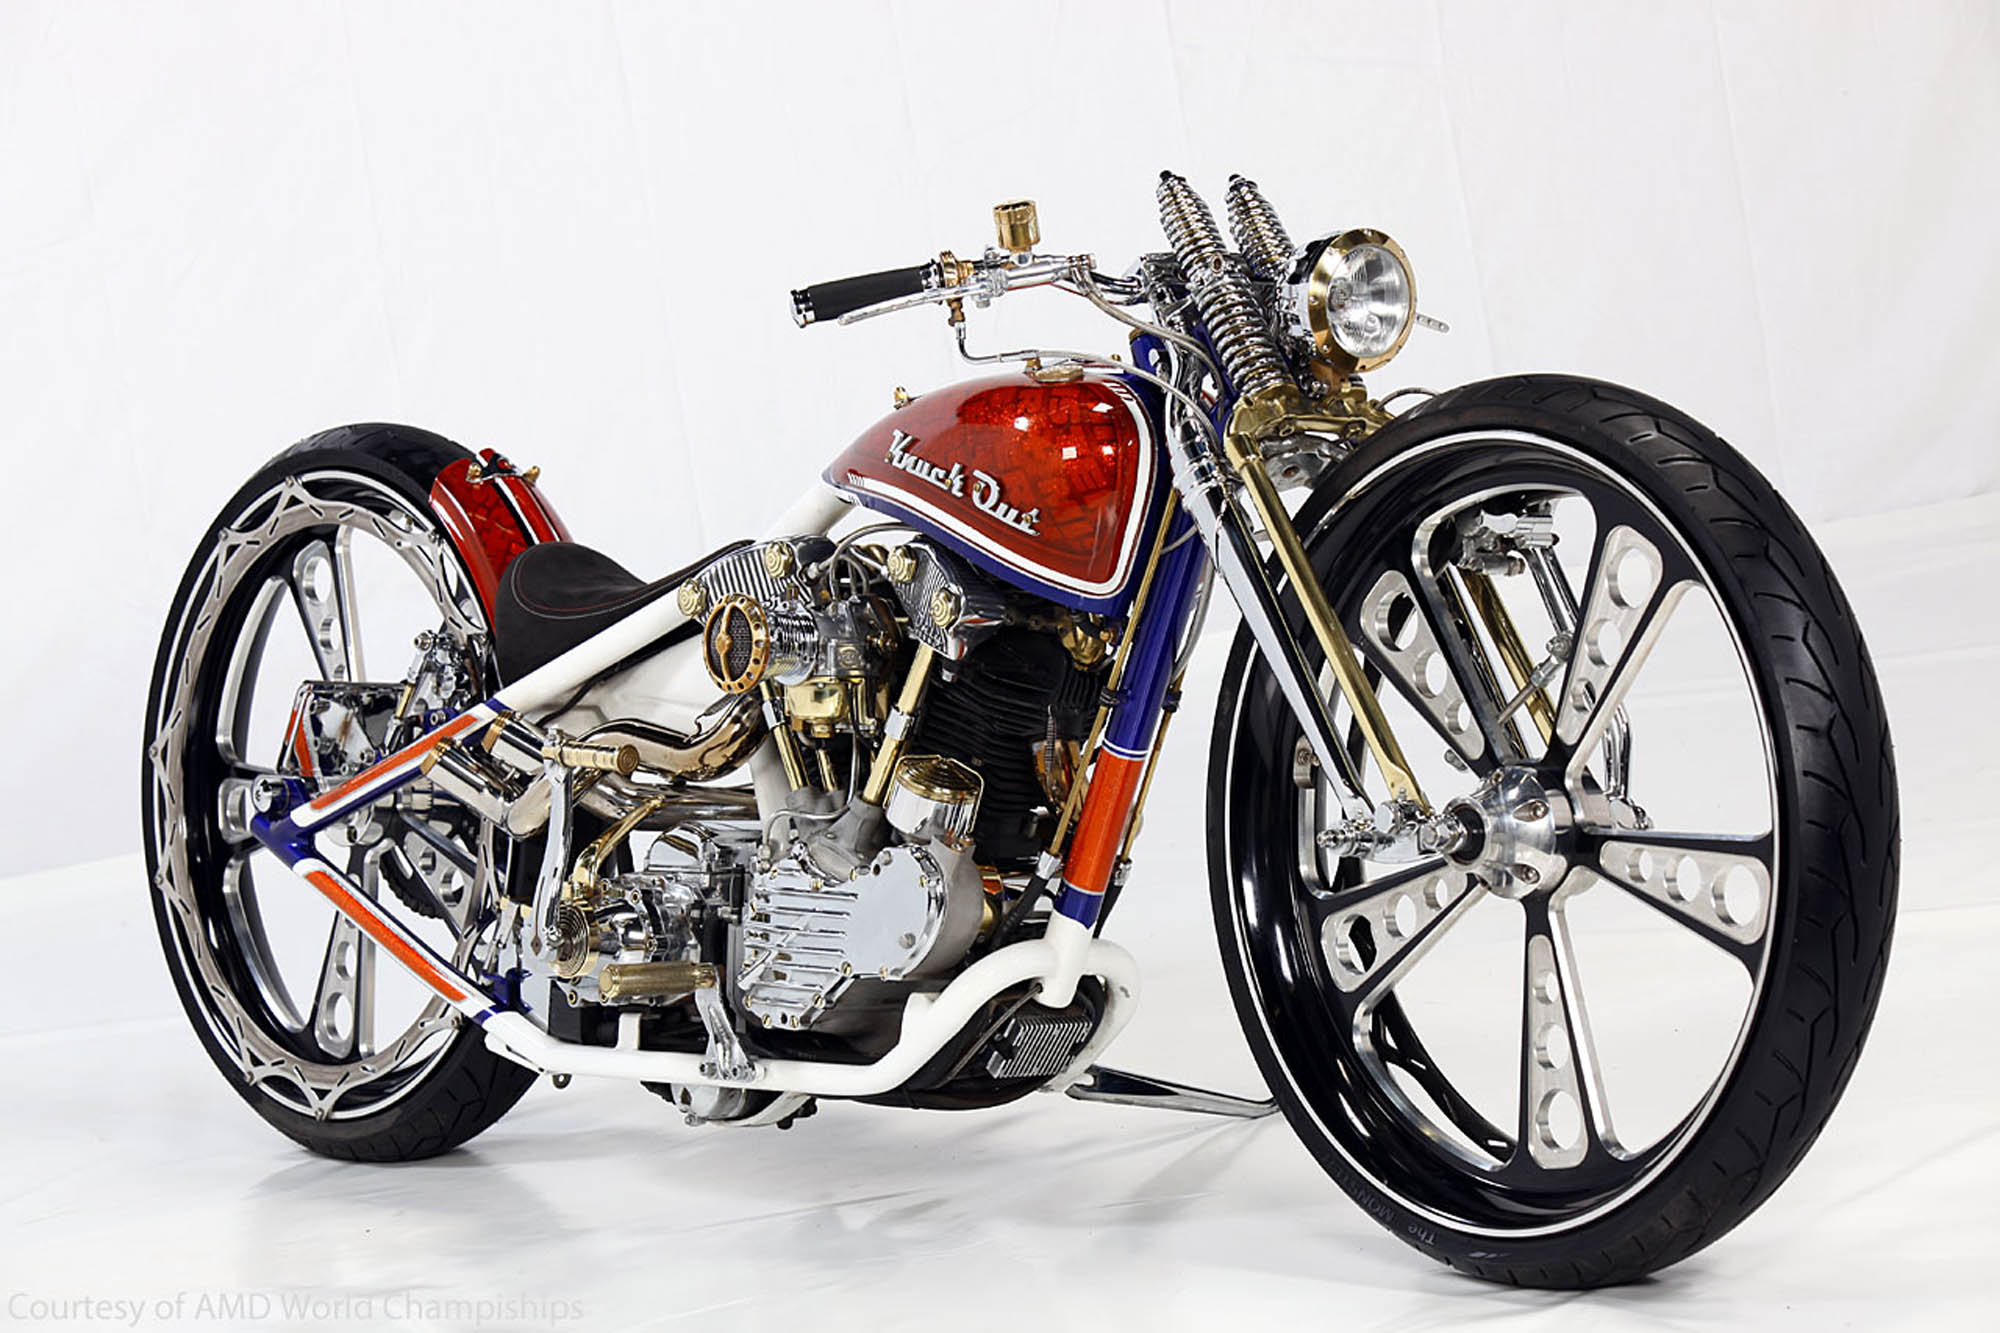 Royal Enfield showcases 4 custom bikes at Delhi store